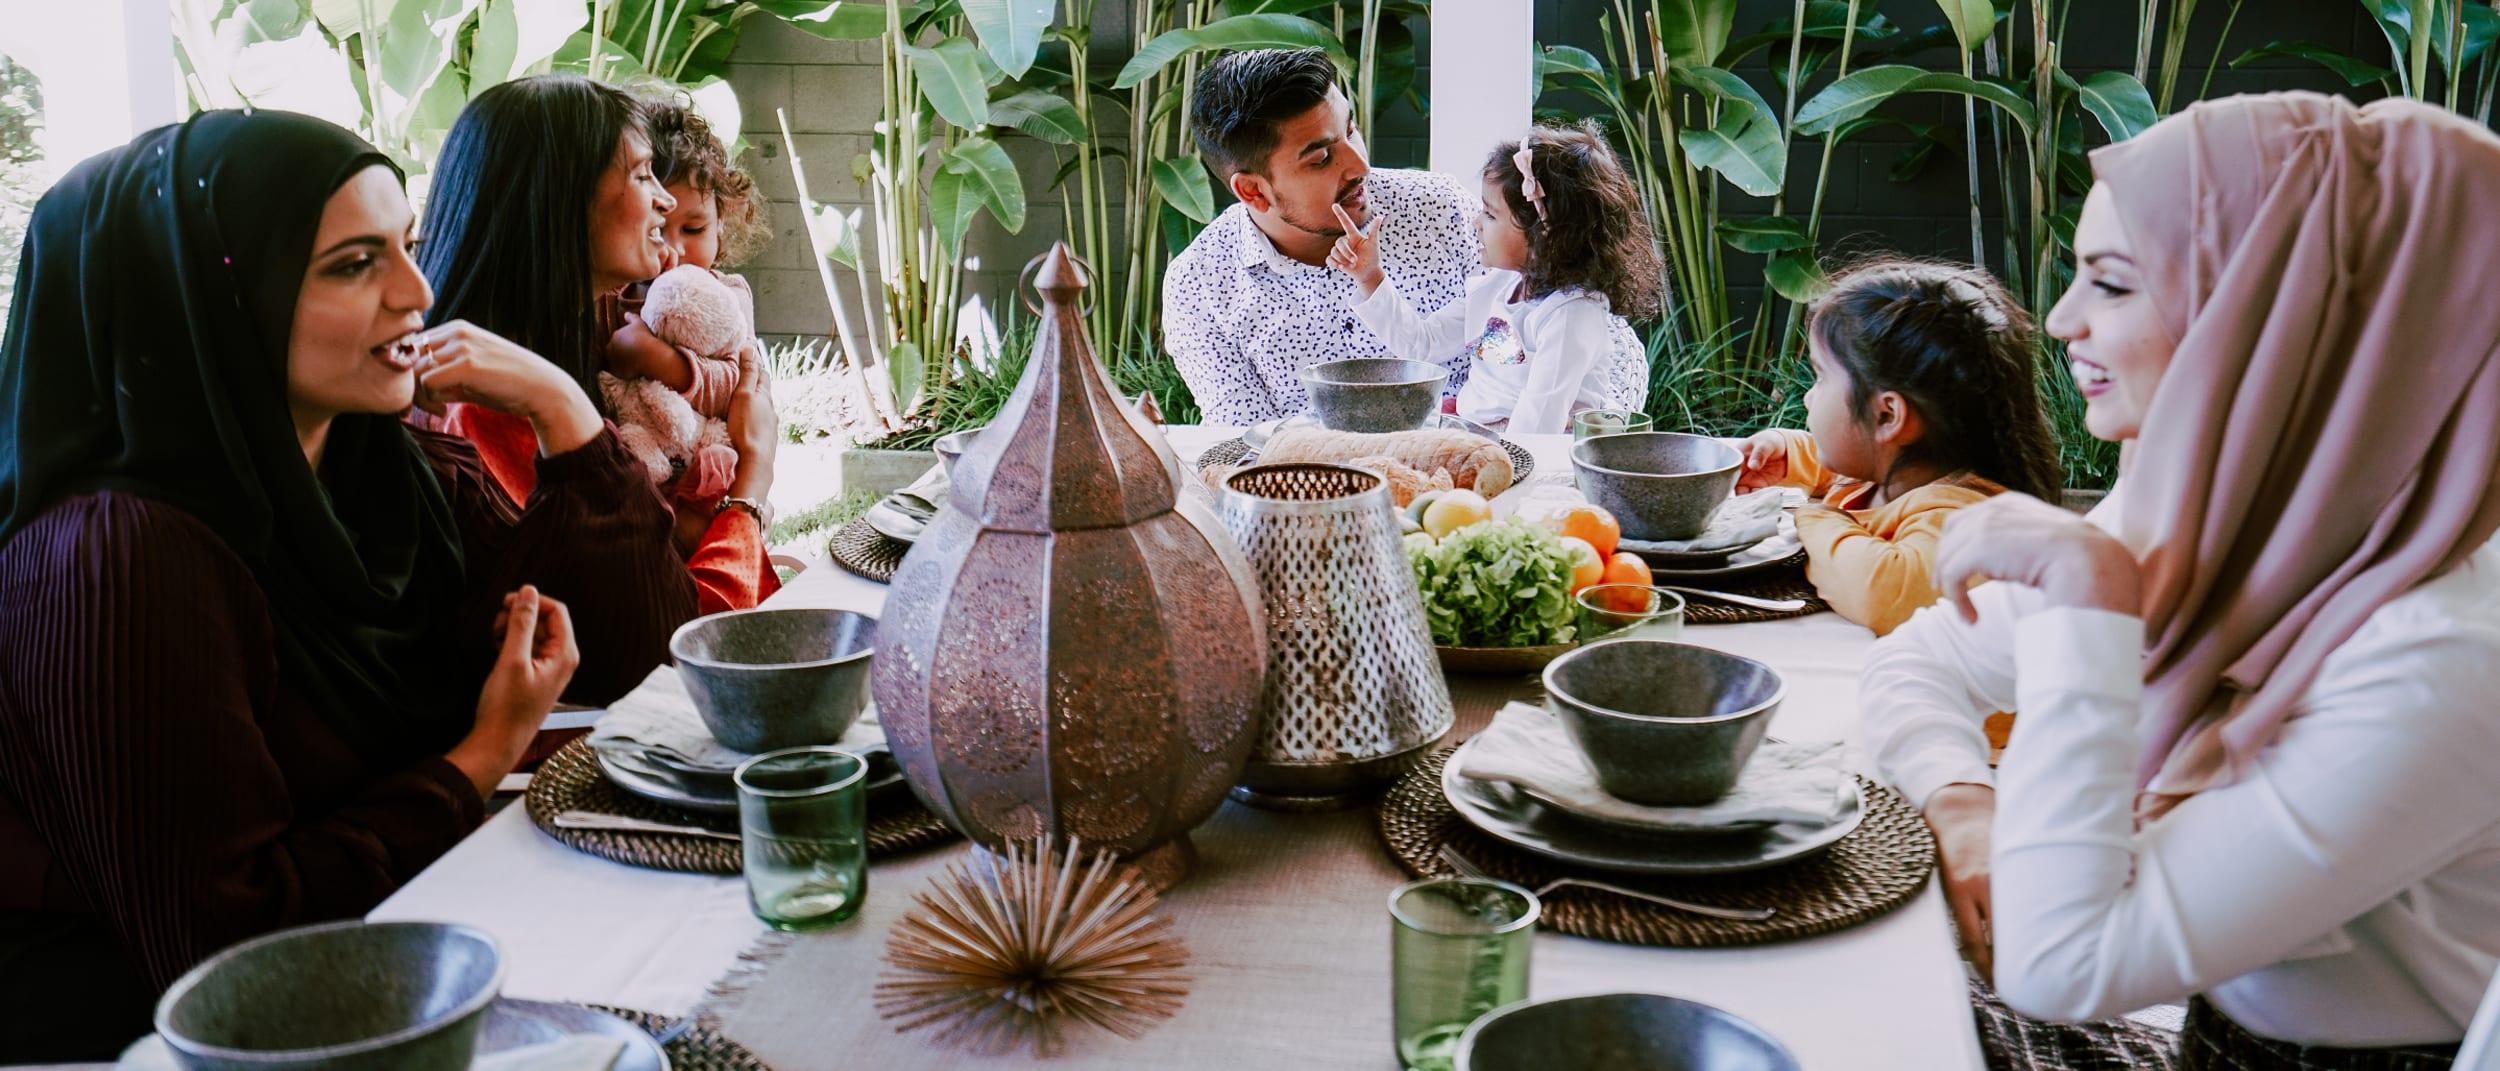 Homewares vibes for Eid al-Fitr